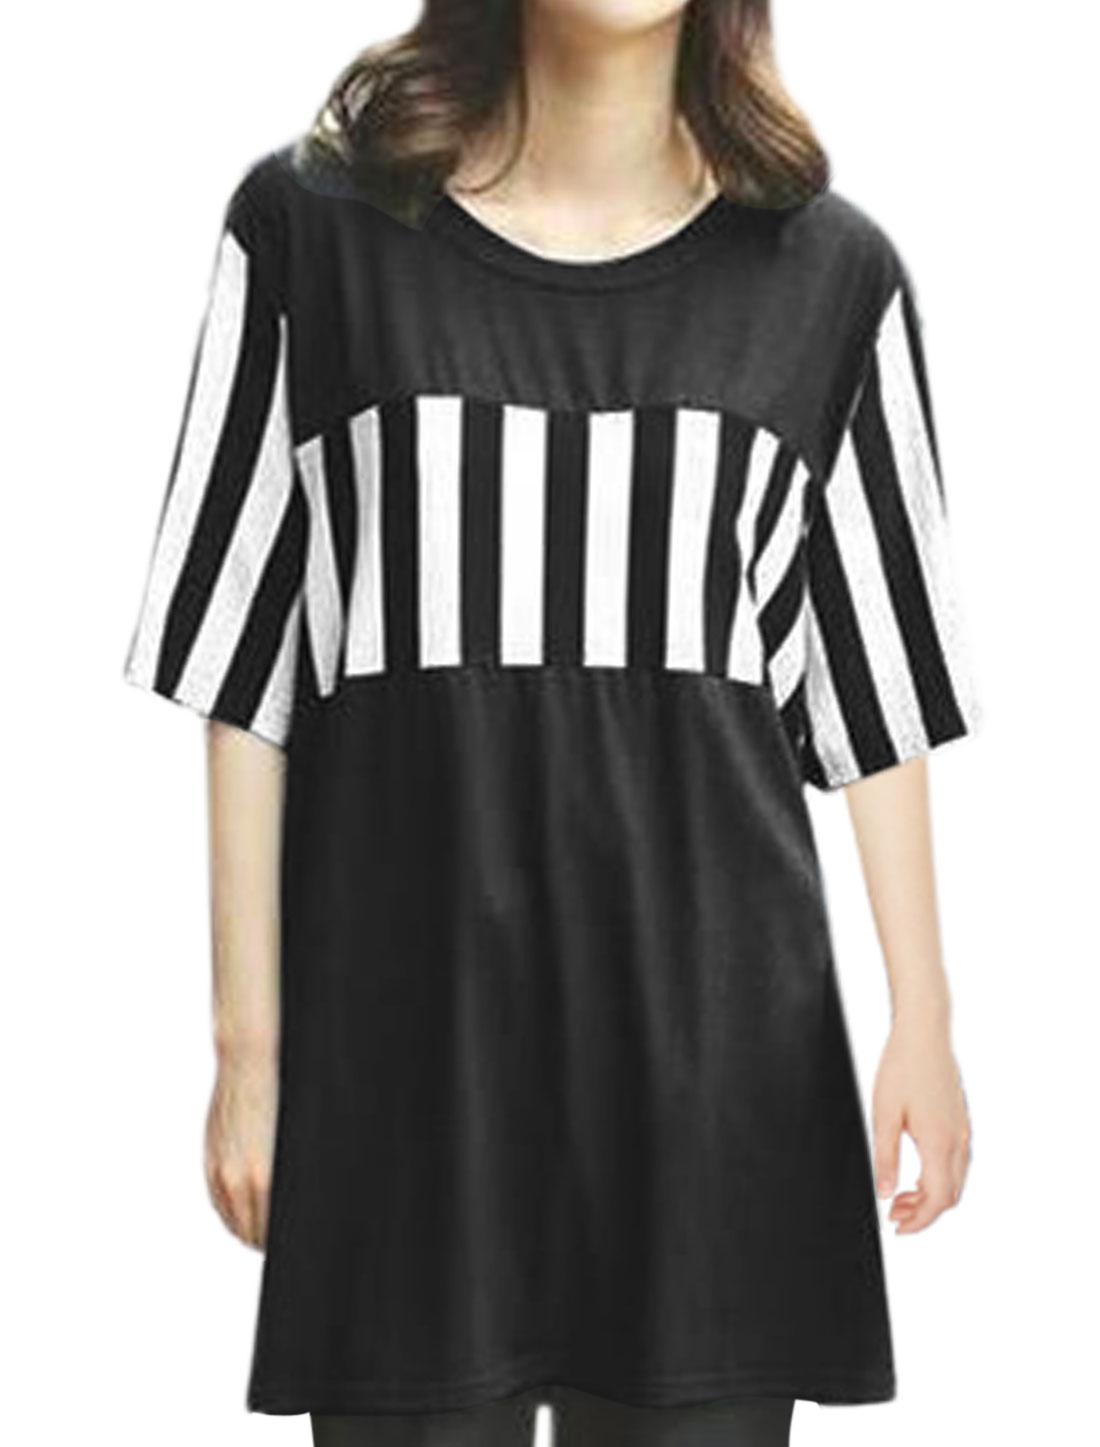 Women Half Sleeves Stripes Loose Tunic T-Shirt Black M